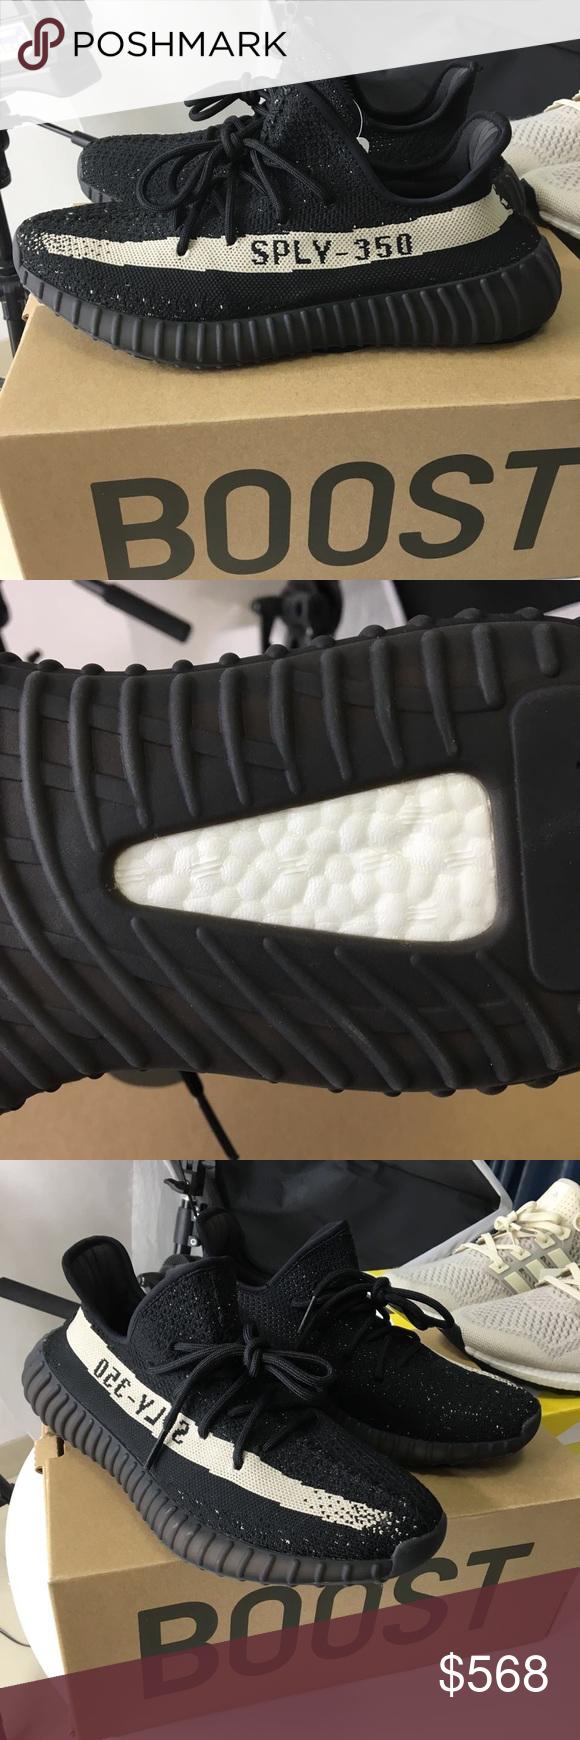 4d987230292 Adidas Yeezy Boost V2 Oreo size 9.5 Adidas Yeezy Boost V2 Oreo size 9.5 adidas  Shoes Sneakers